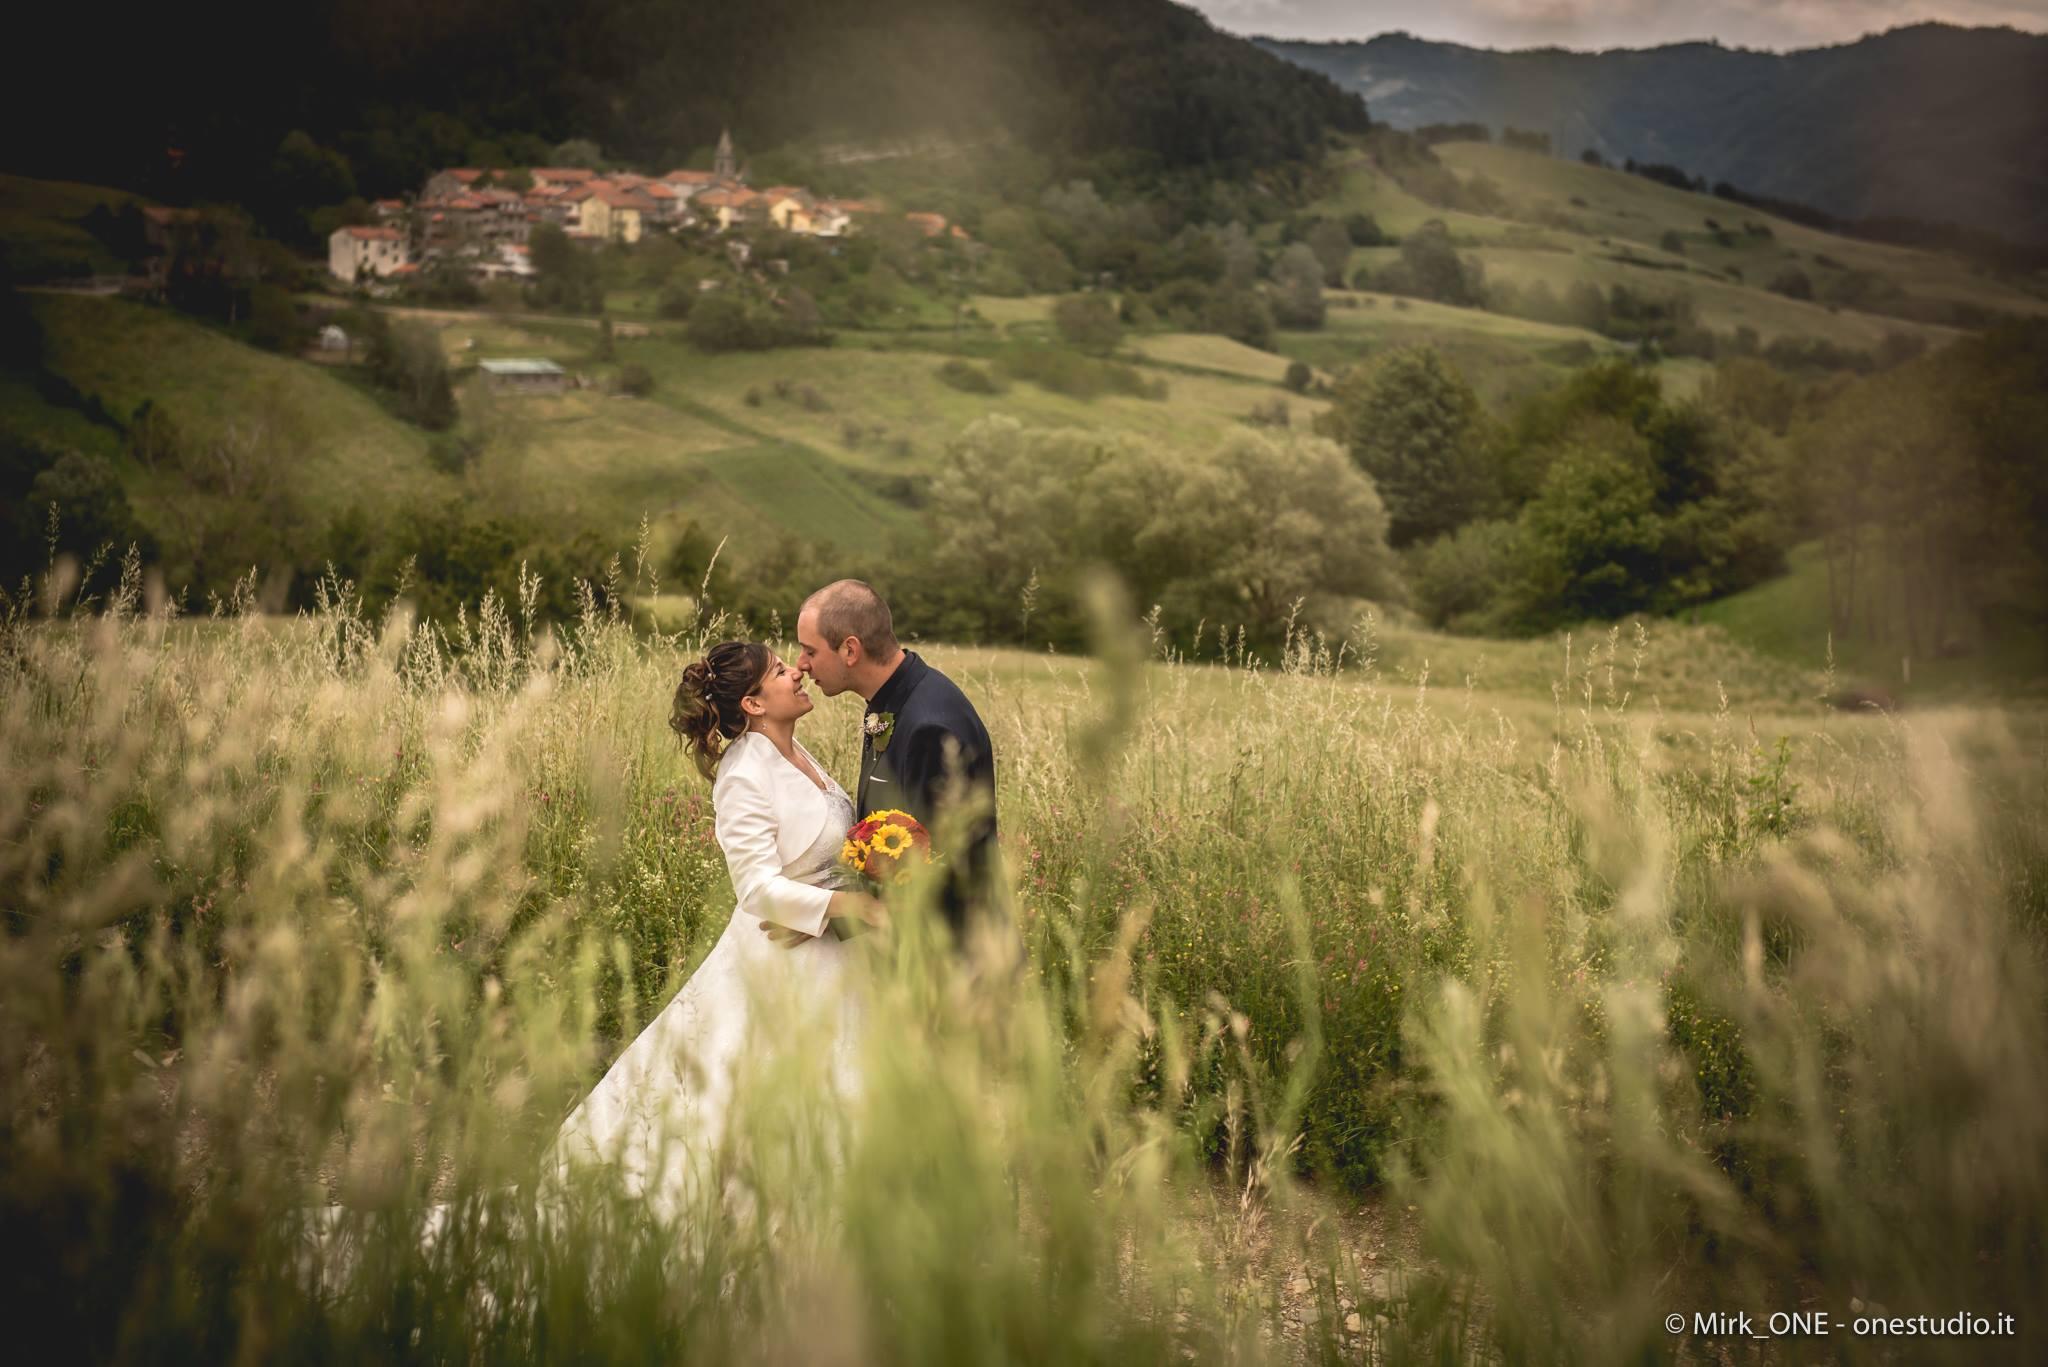 https://lnx.mirkone.it/wp-content/uploads/2015/07/mirk_ONE-fotografo-matrimonio-00806.jpg